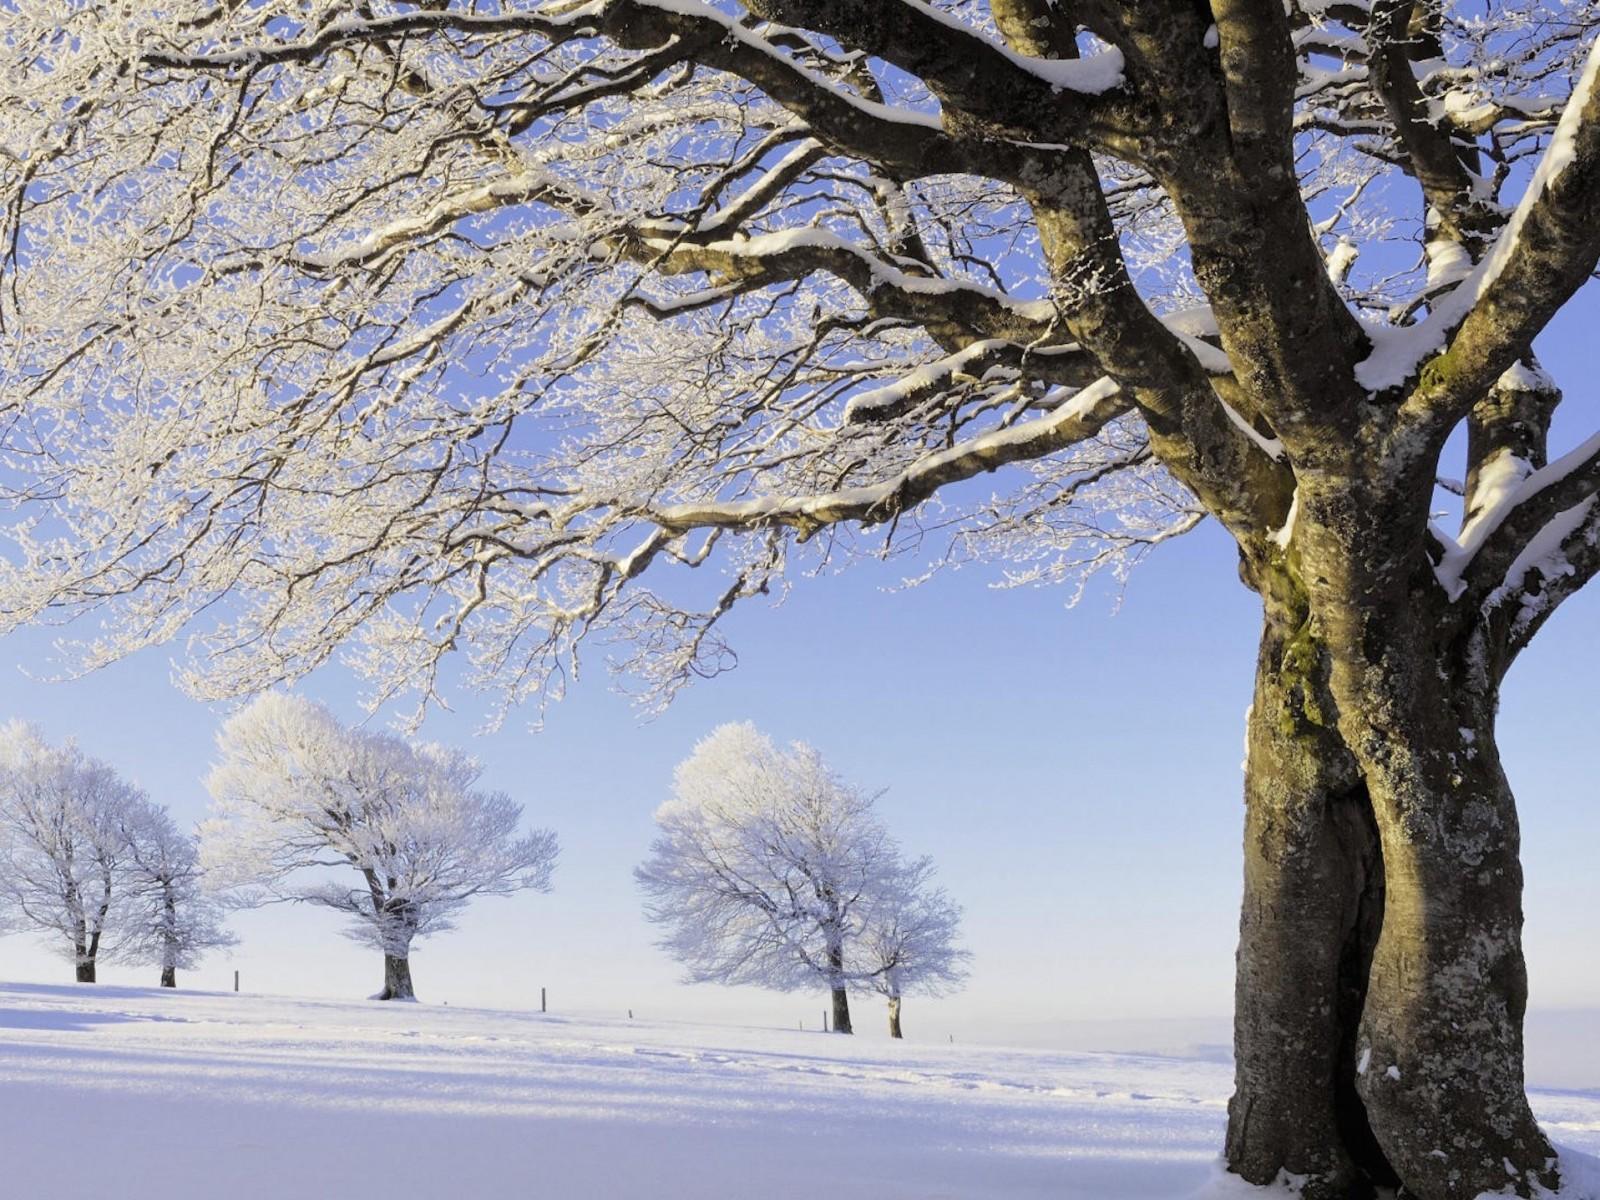 Snowy Black Forest Germany Wallpaper HD Image WallpaperGeeks 1600x1200